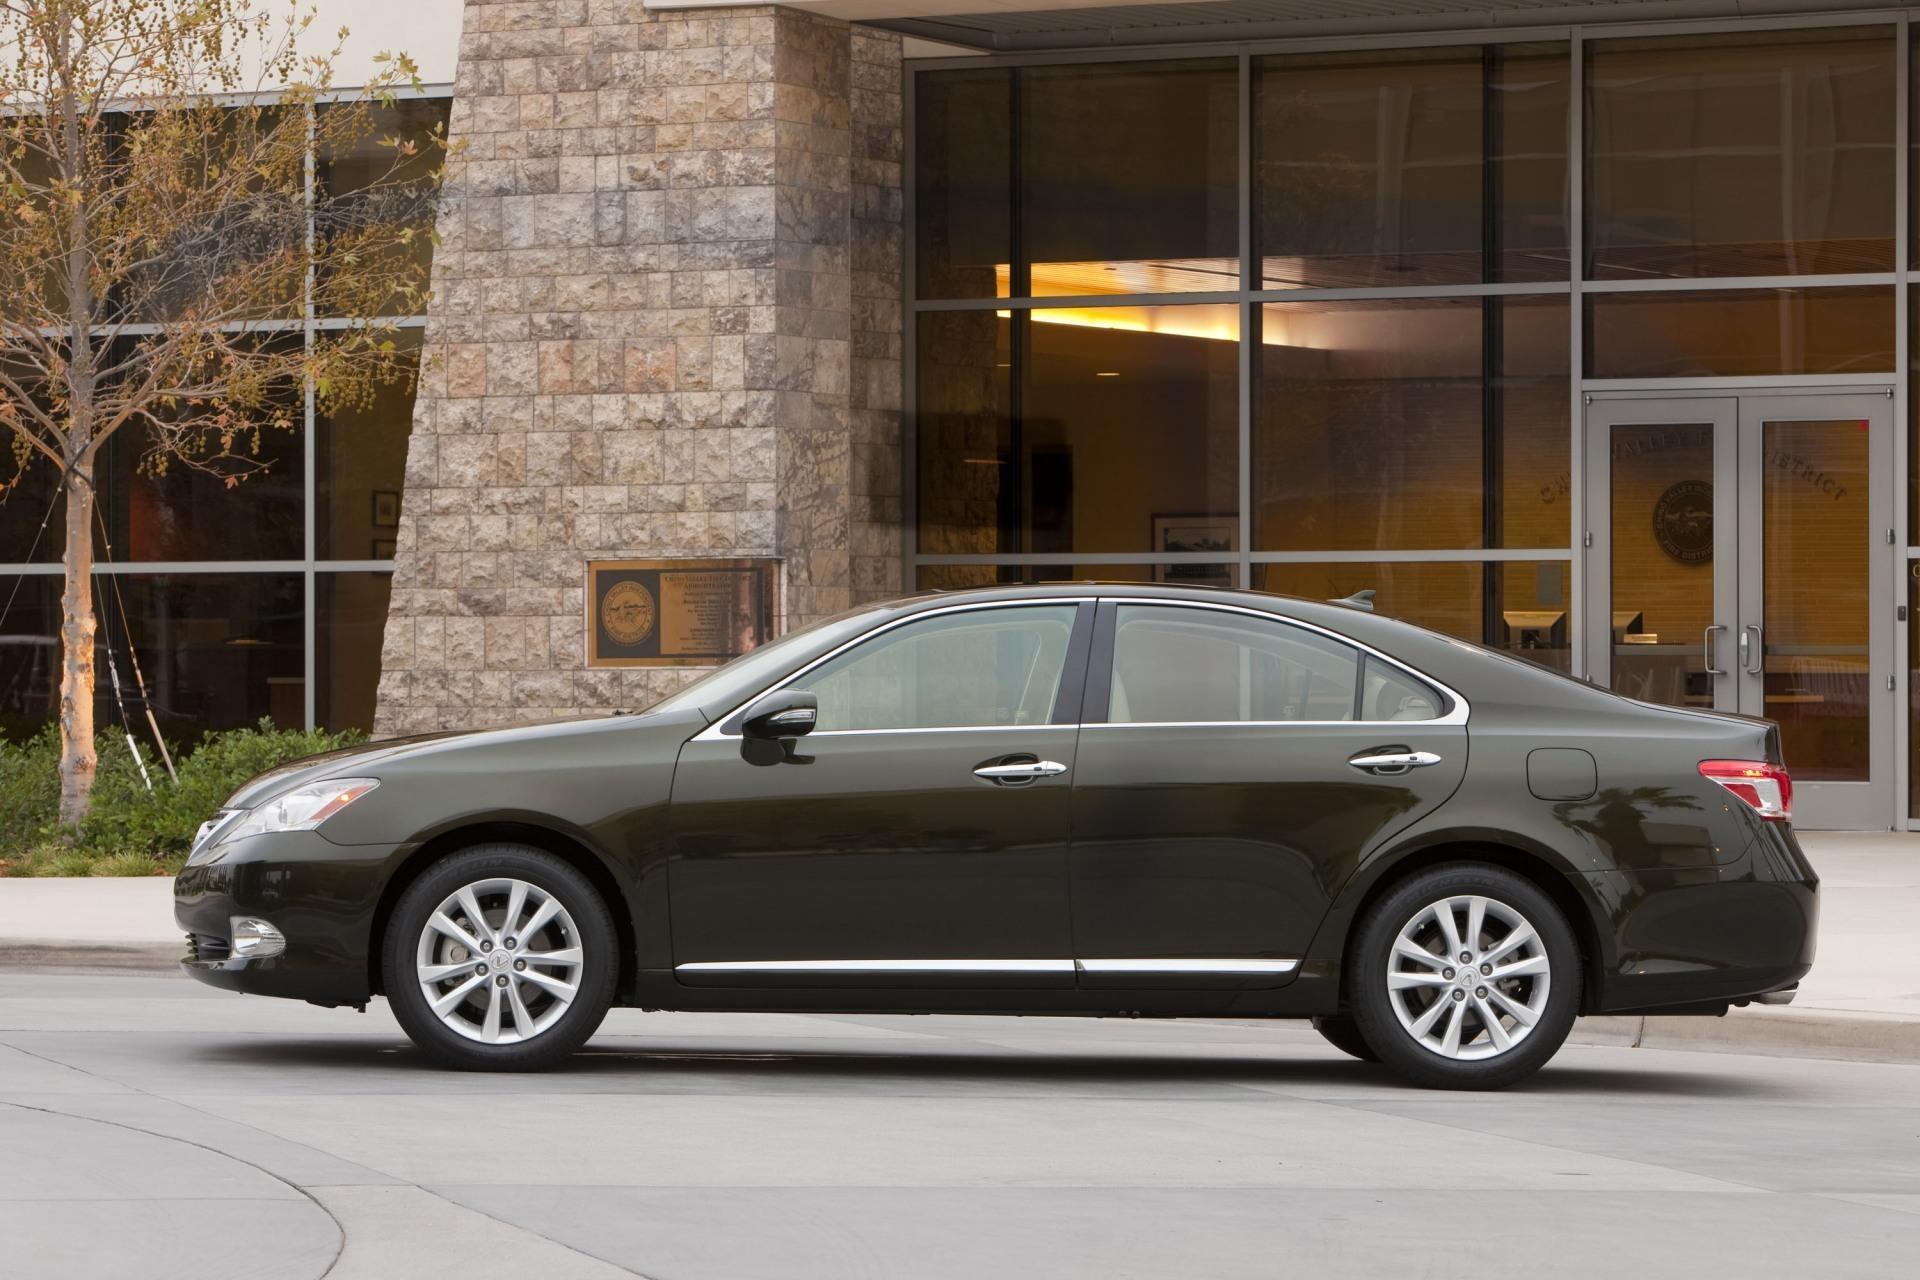 2010 Lexus Es 350 News And Information Conceptcarz